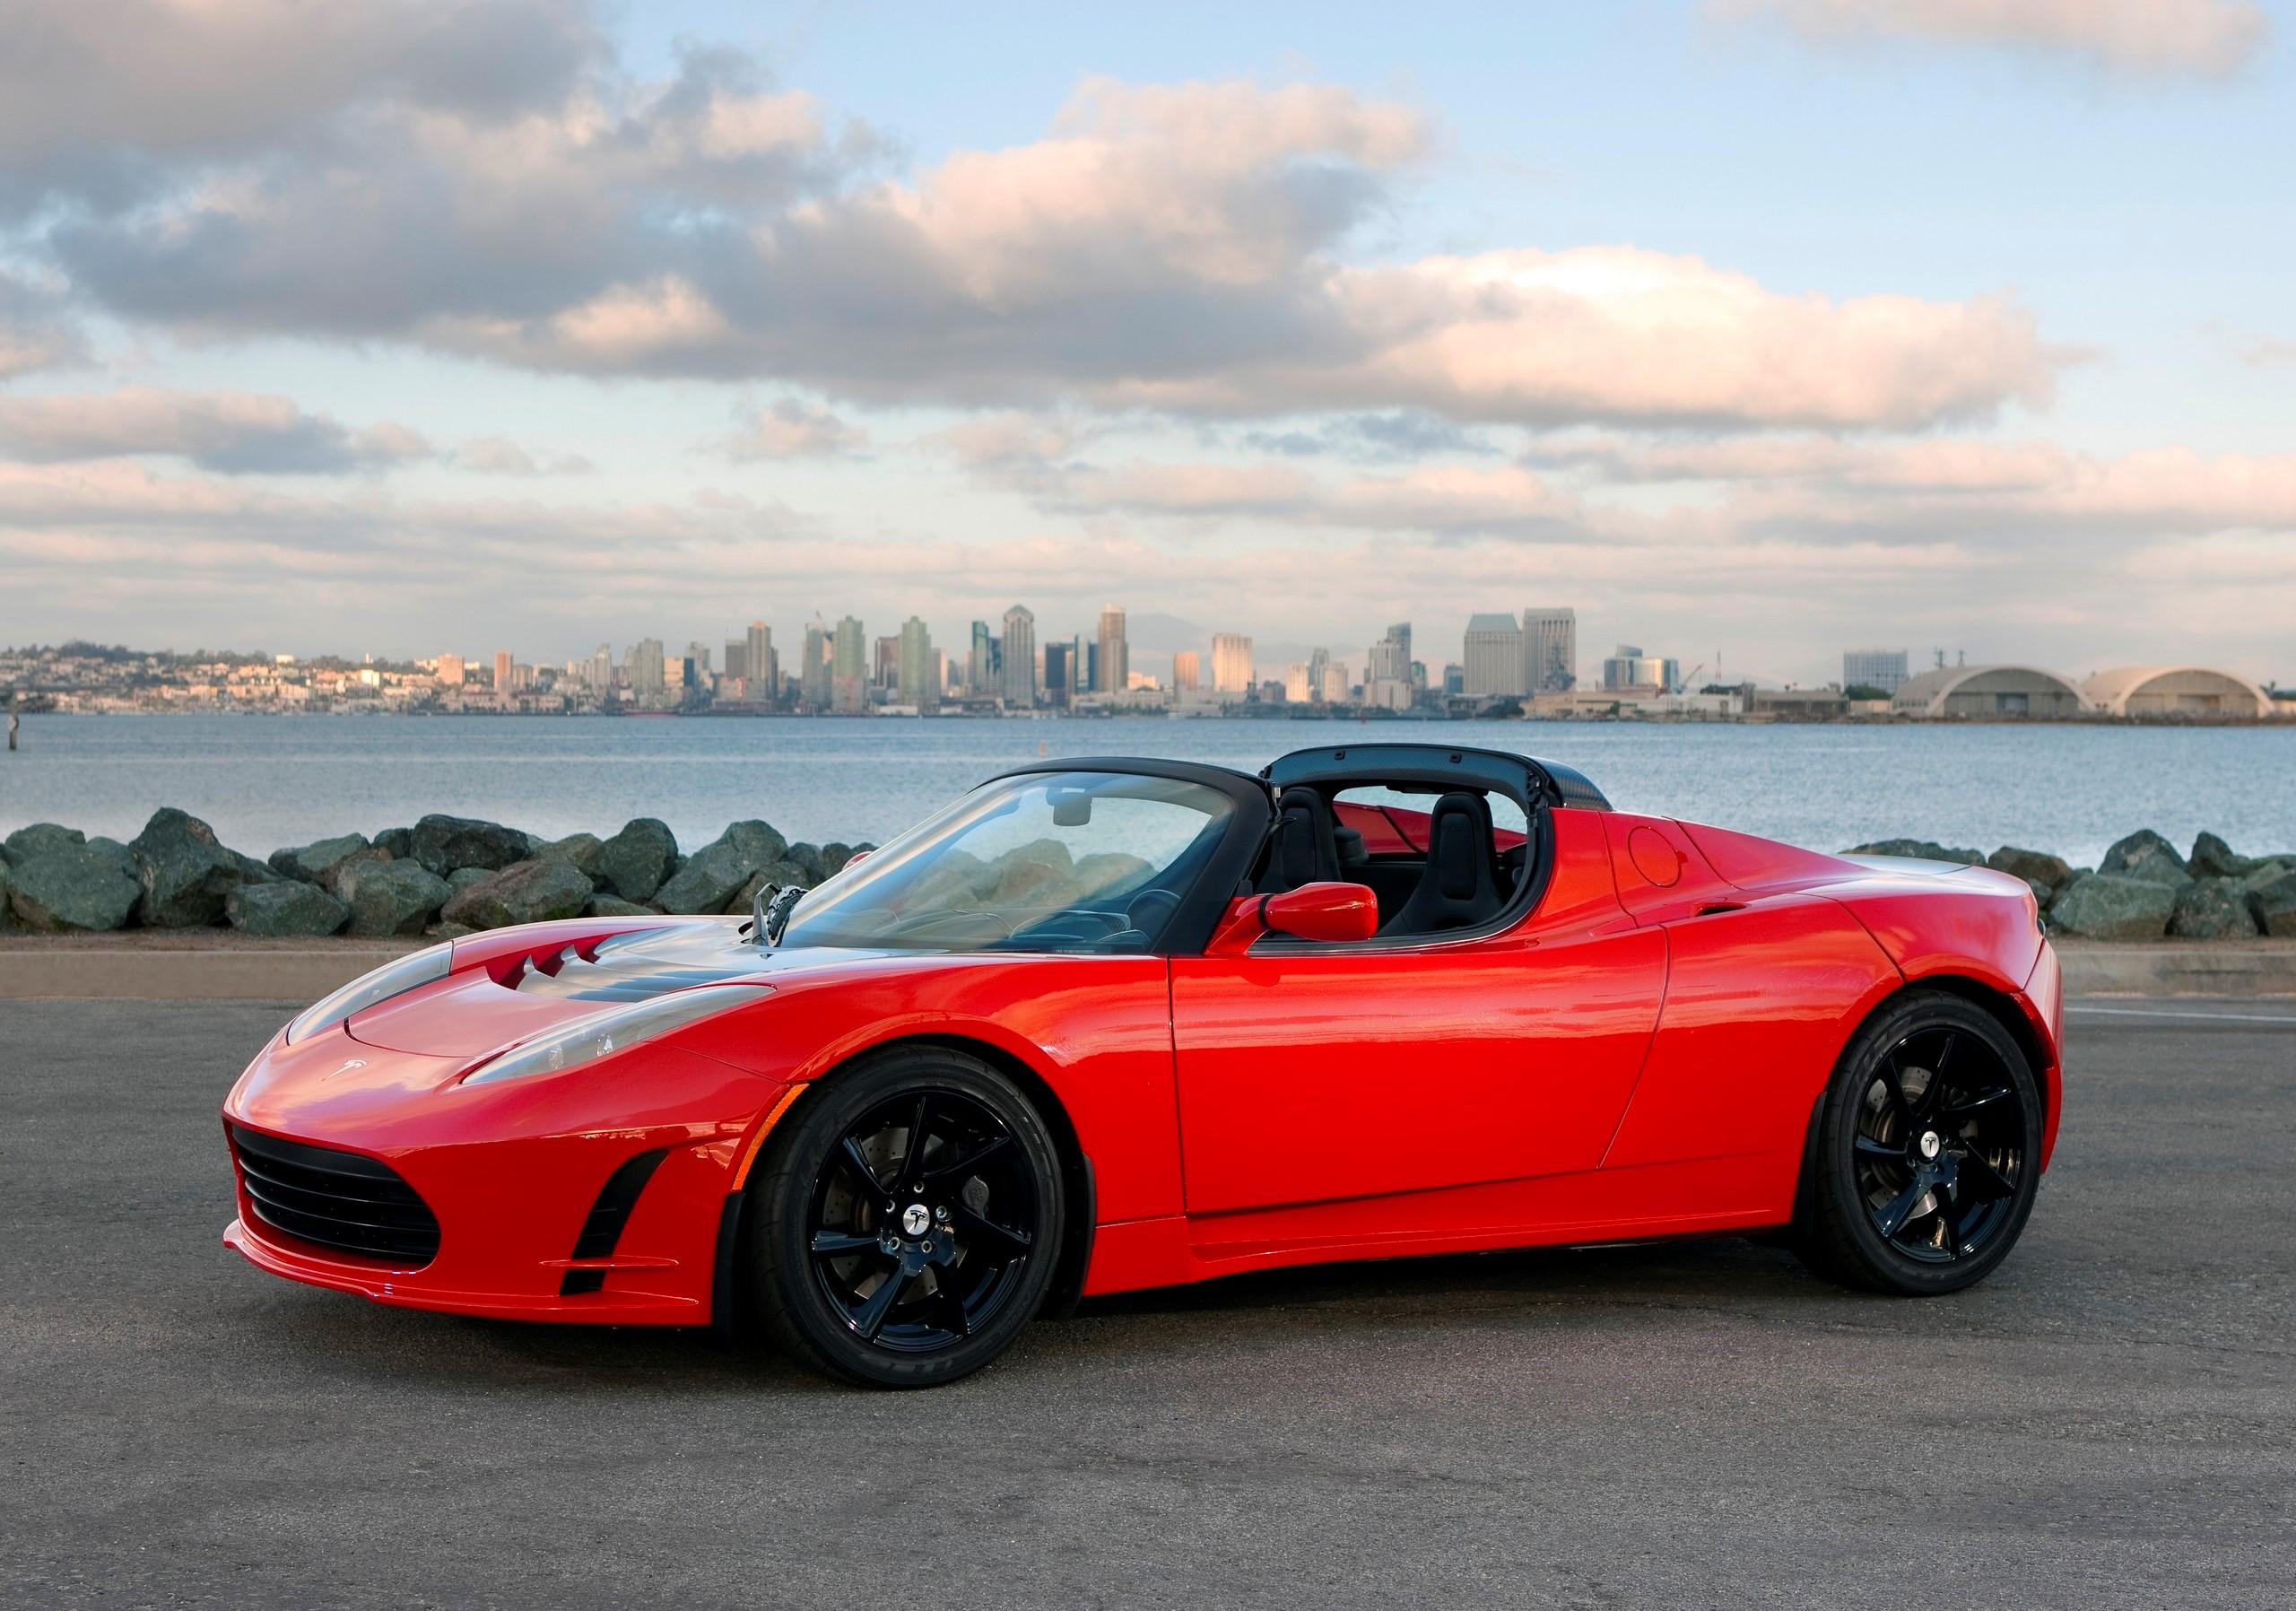 Tesla Roadster Review Wallpaper Download High Resolution